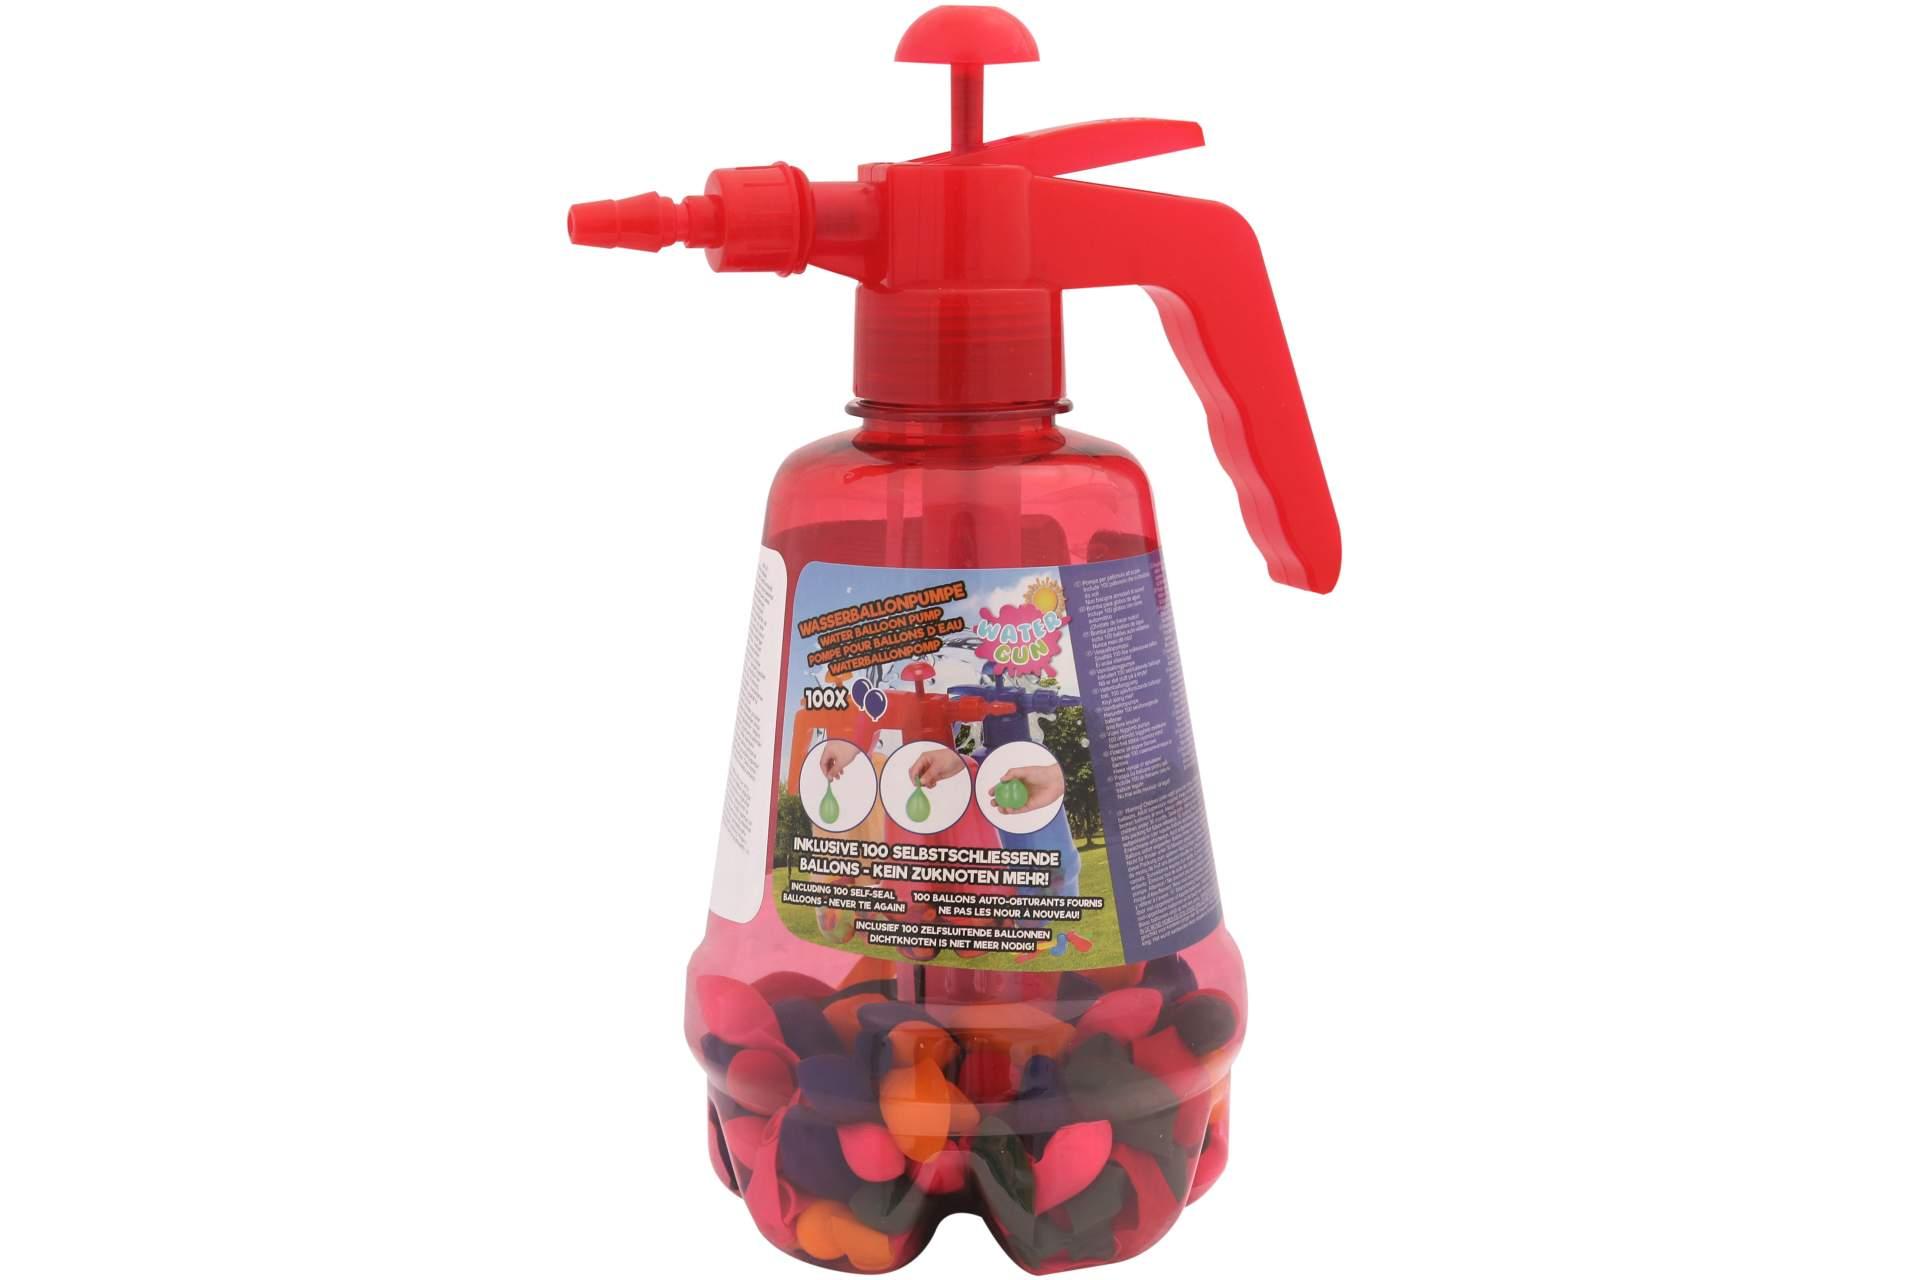 wasserballons 100 stk selbstschlie end ballonpumpe rot spielzeug f r drau en spielwaren. Black Bedroom Furniture Sets. Home Design Ideas